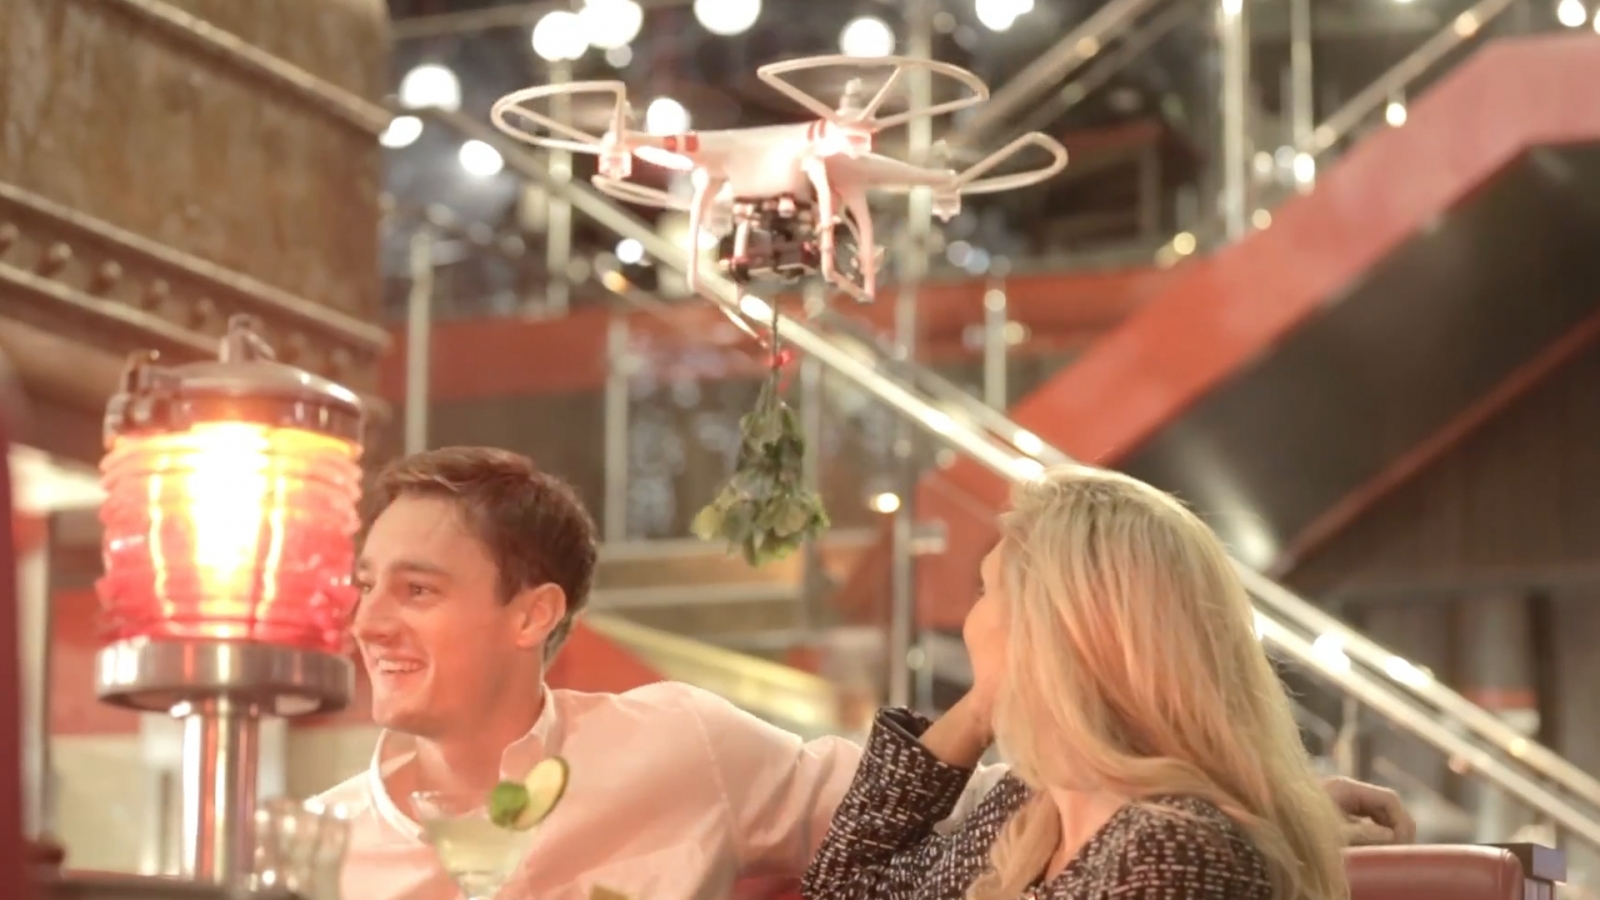 Restaurant Launches Mistletoe Drones for Christmas